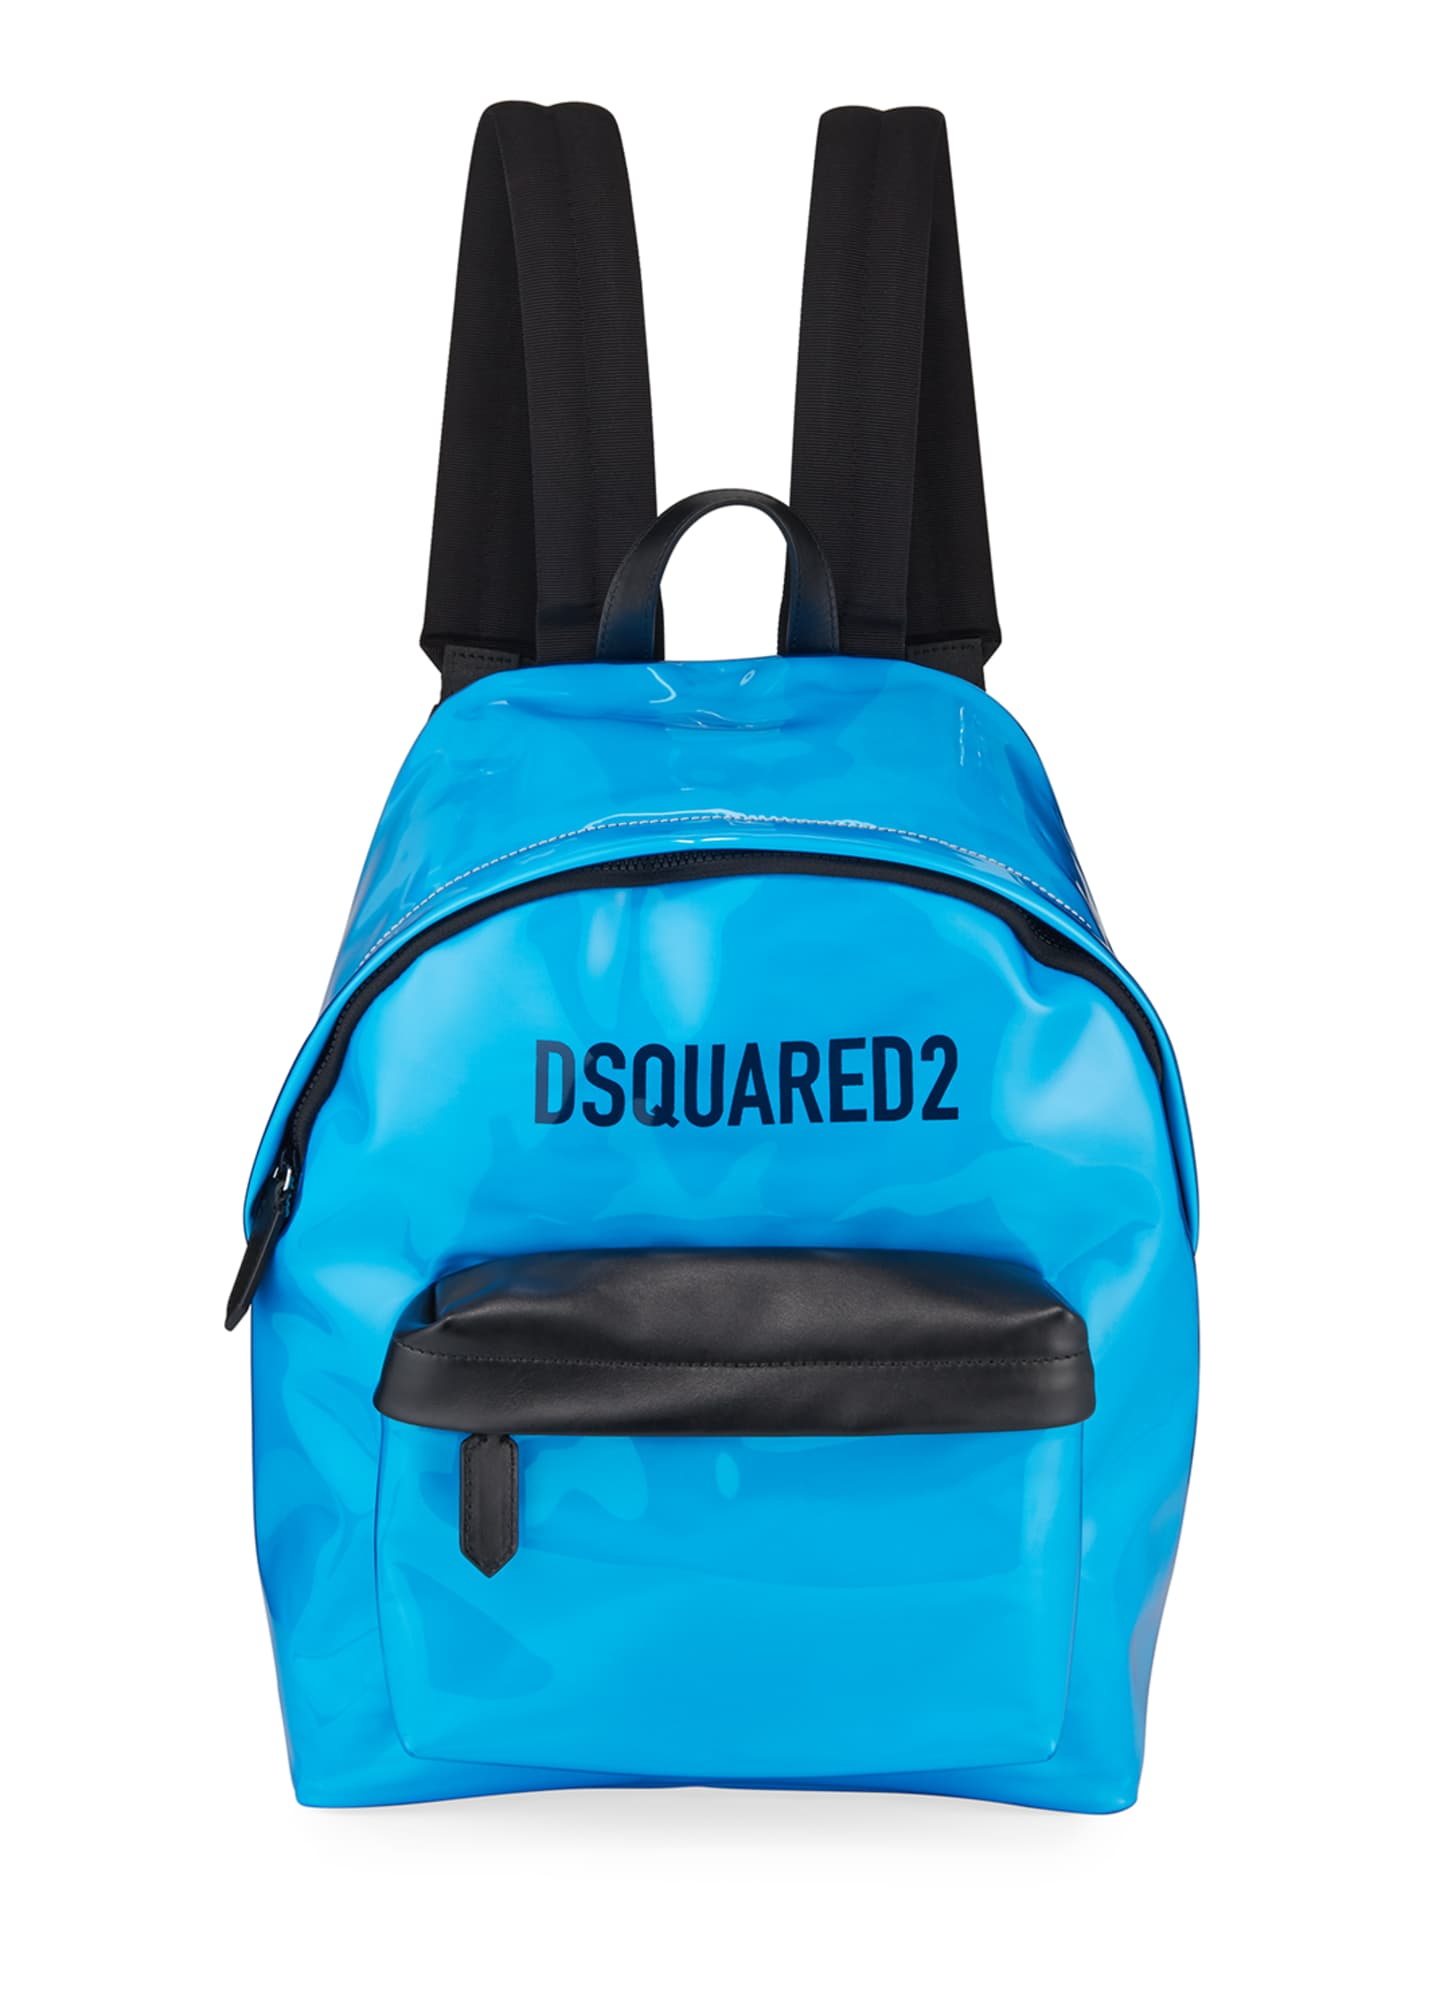 Dsquared2 Men's Logo PVC Zip-Top Backpack